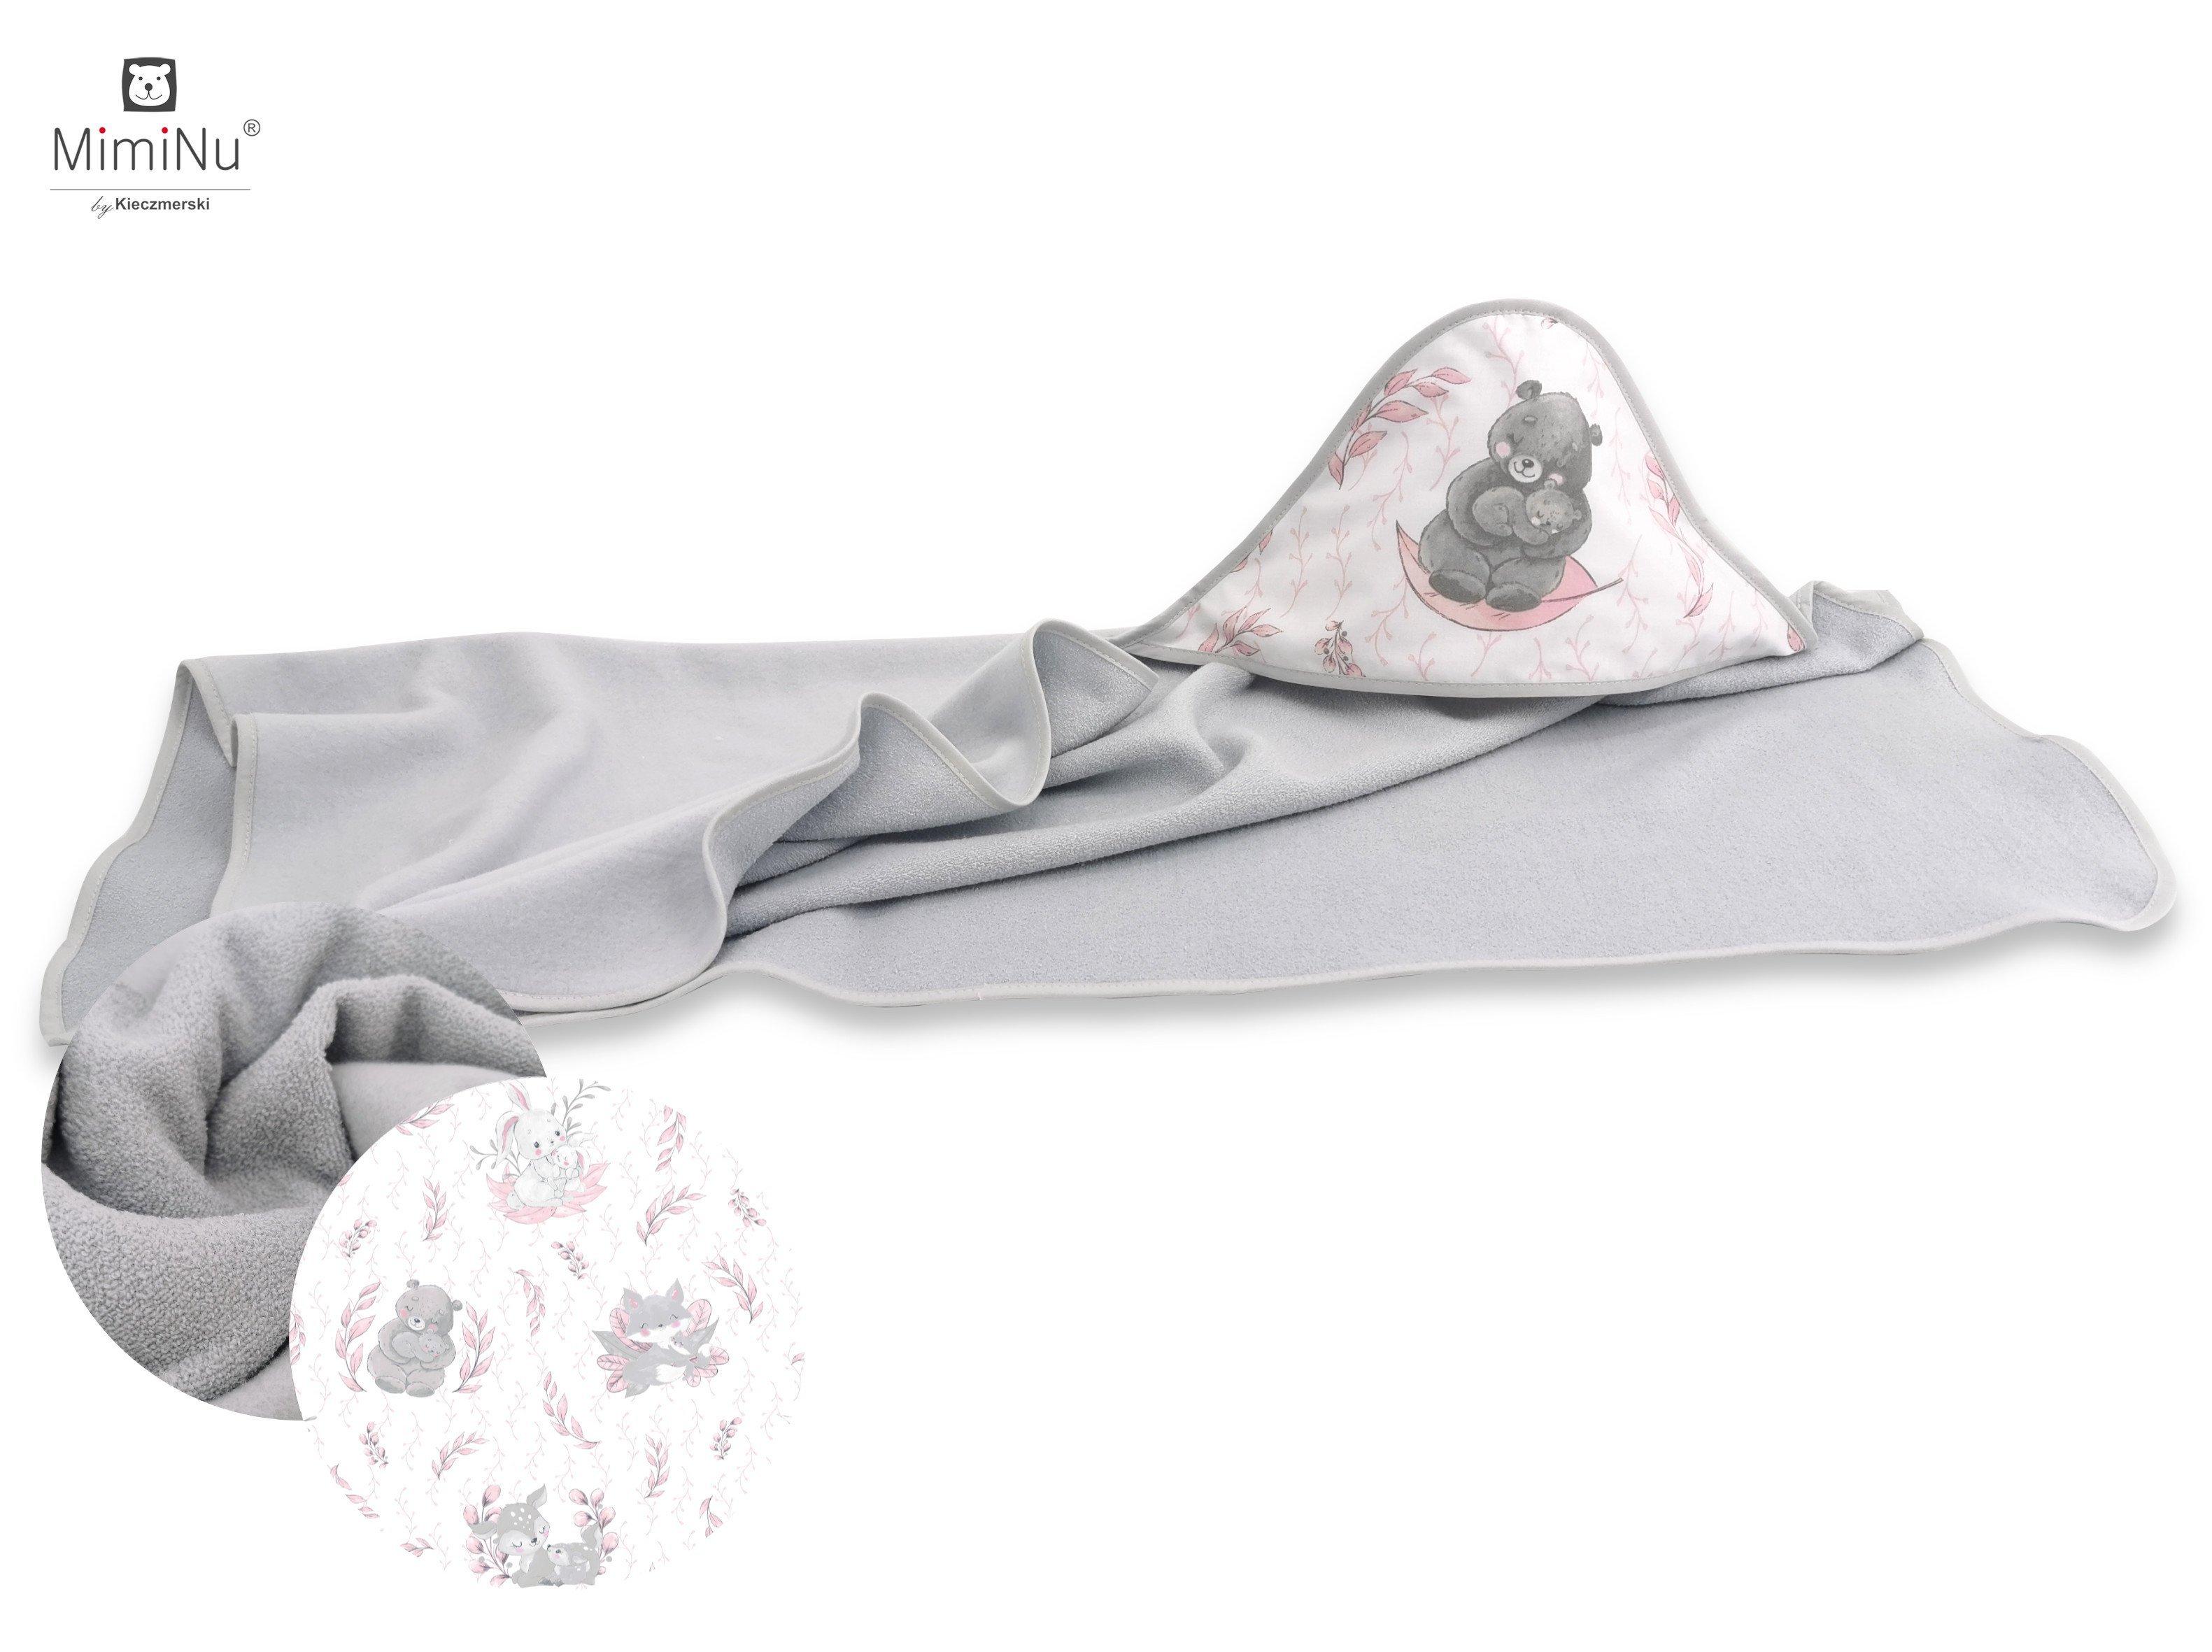 Frot� osu�ka s kapuc�ou 100x100 cm Lulu ru�ovo-siv� - zv��i� obr�zok